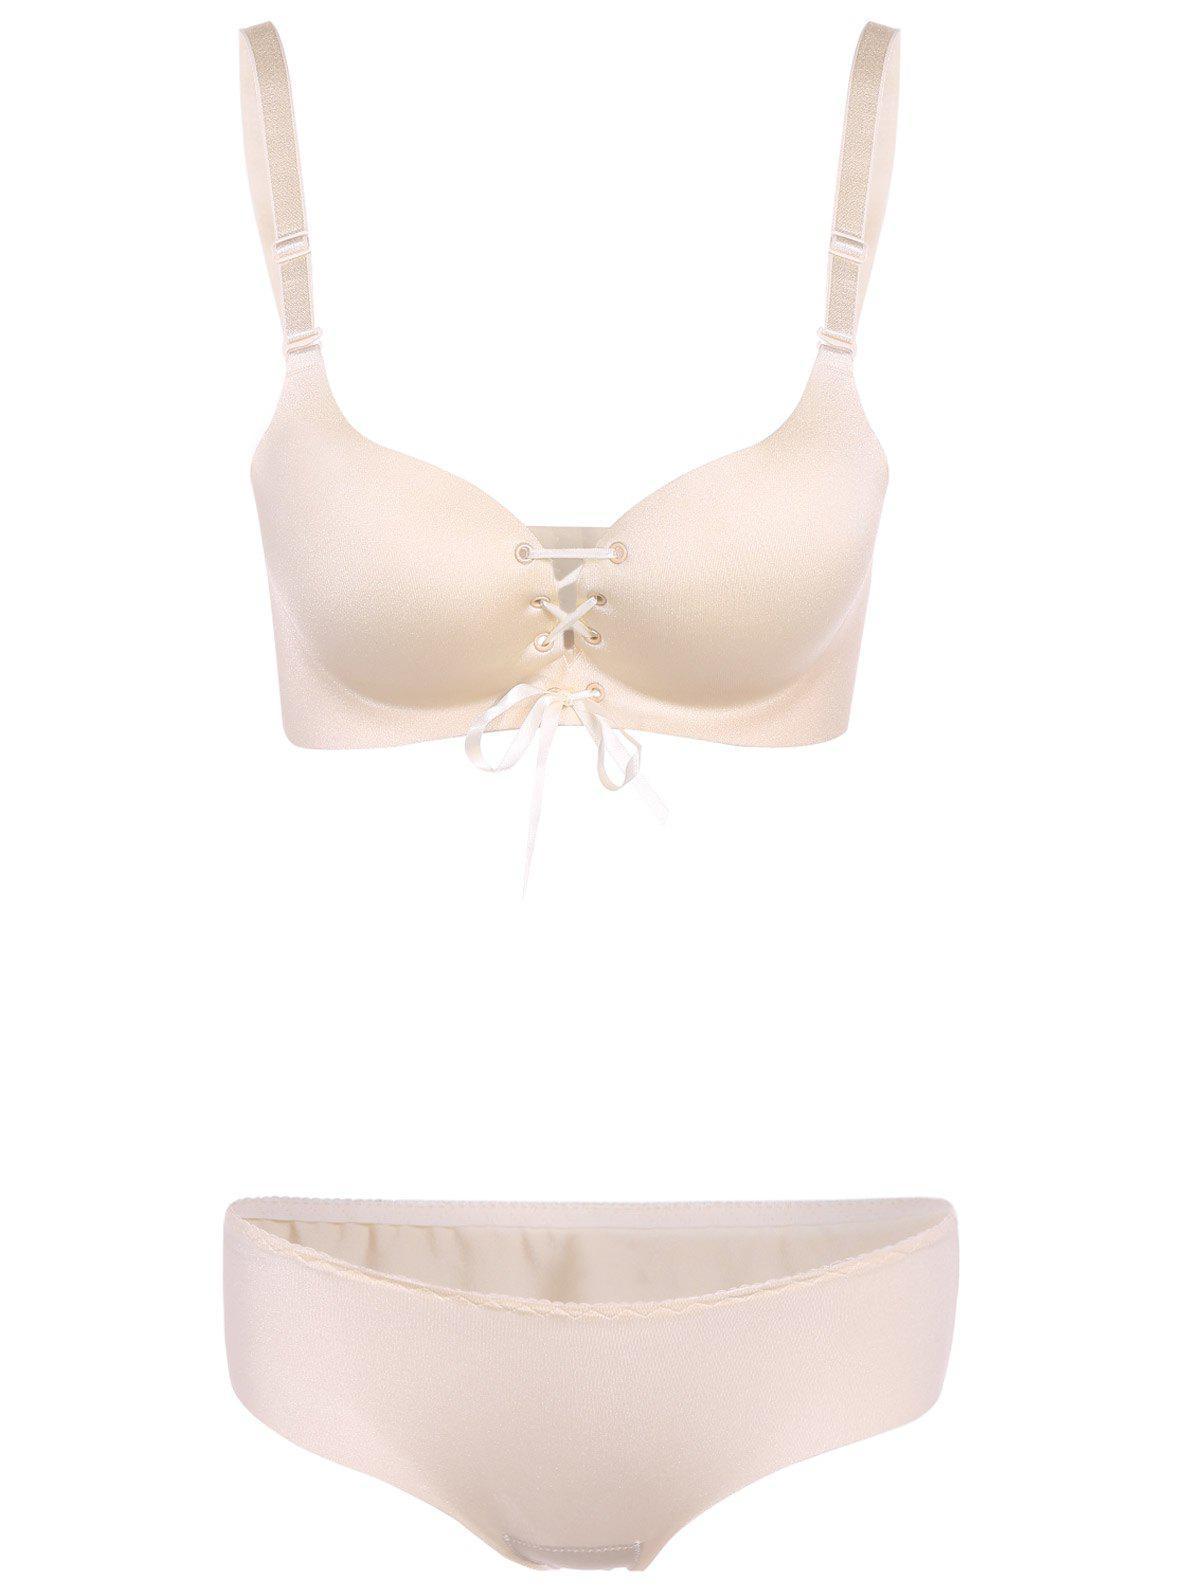 Push Up Lace Up Seamless Underwear Bra Set 197611405